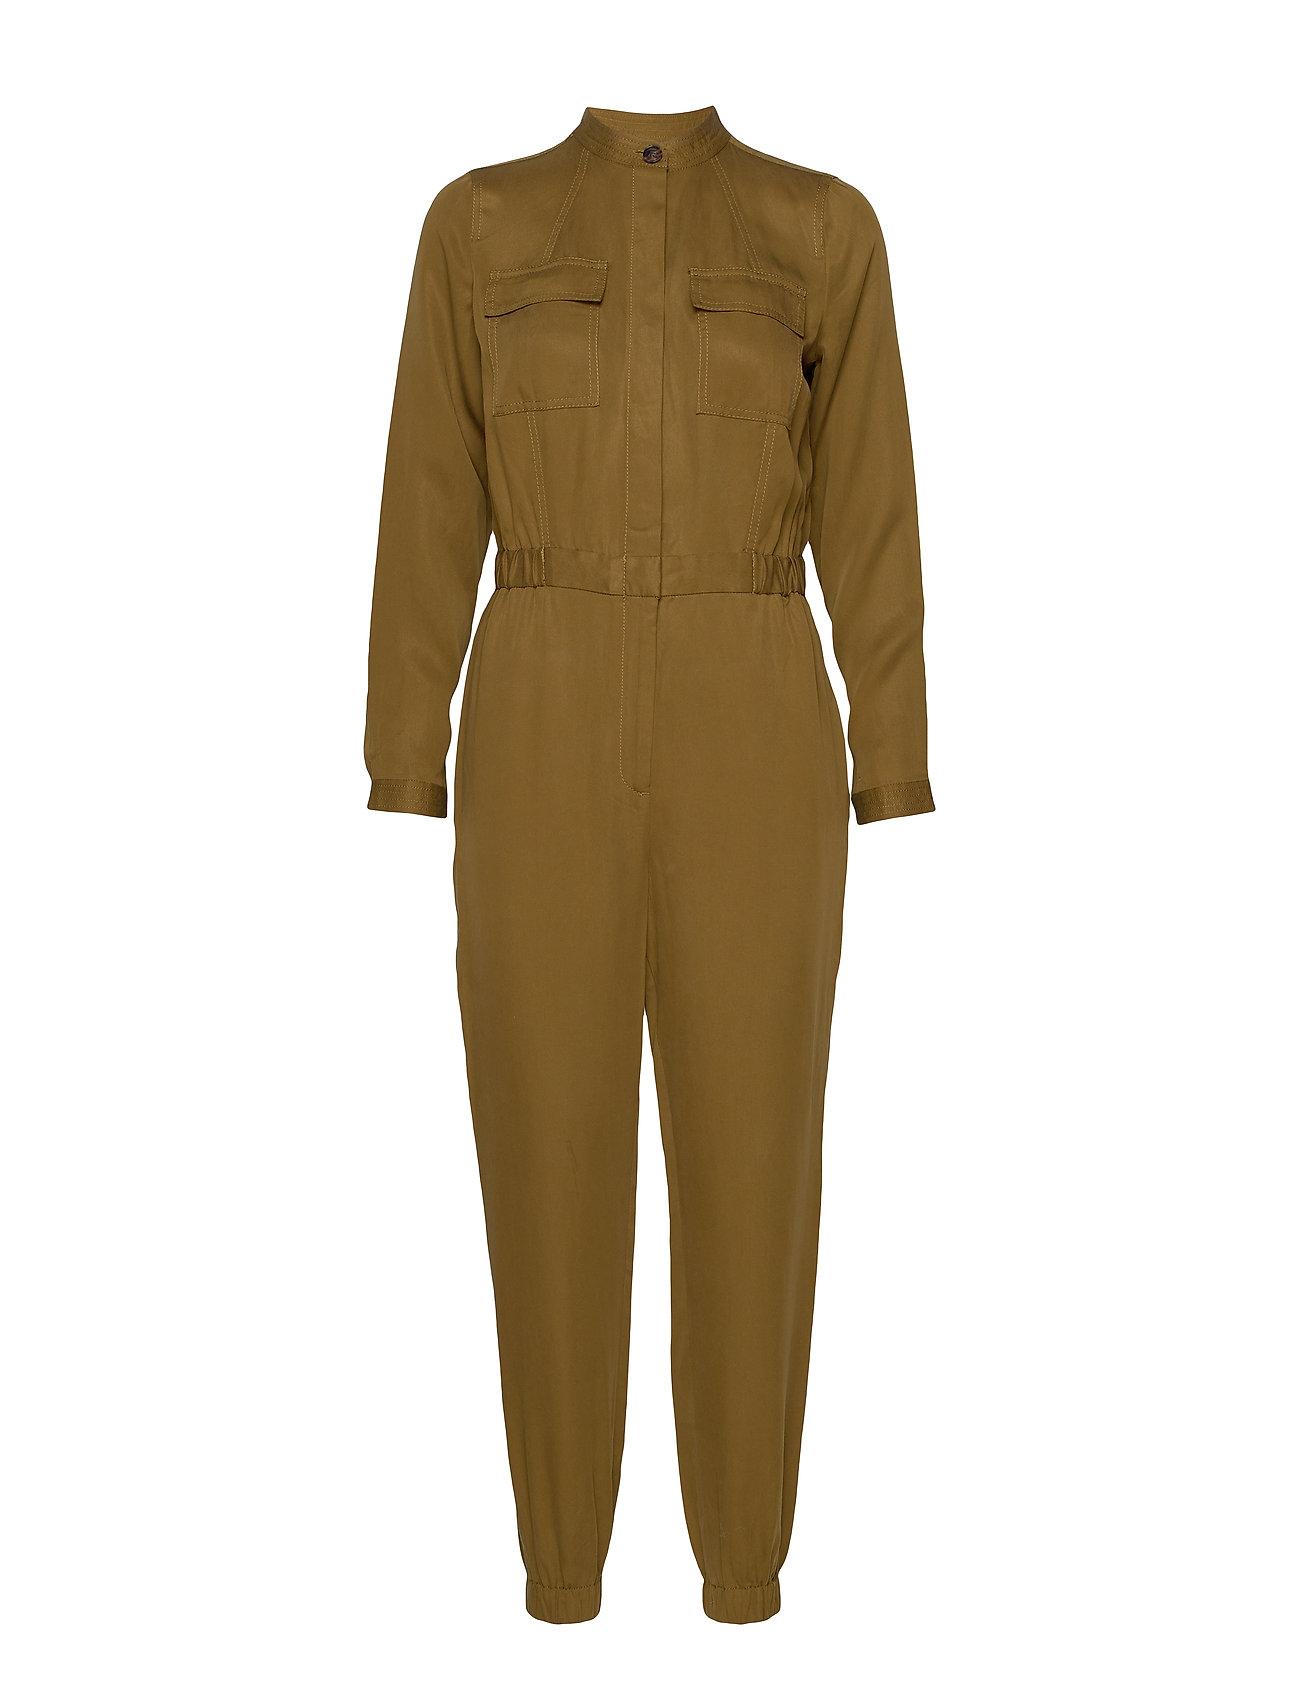 Banana Republic TENCEL™ Flight Jumpsuit - CINDERED OLIVE